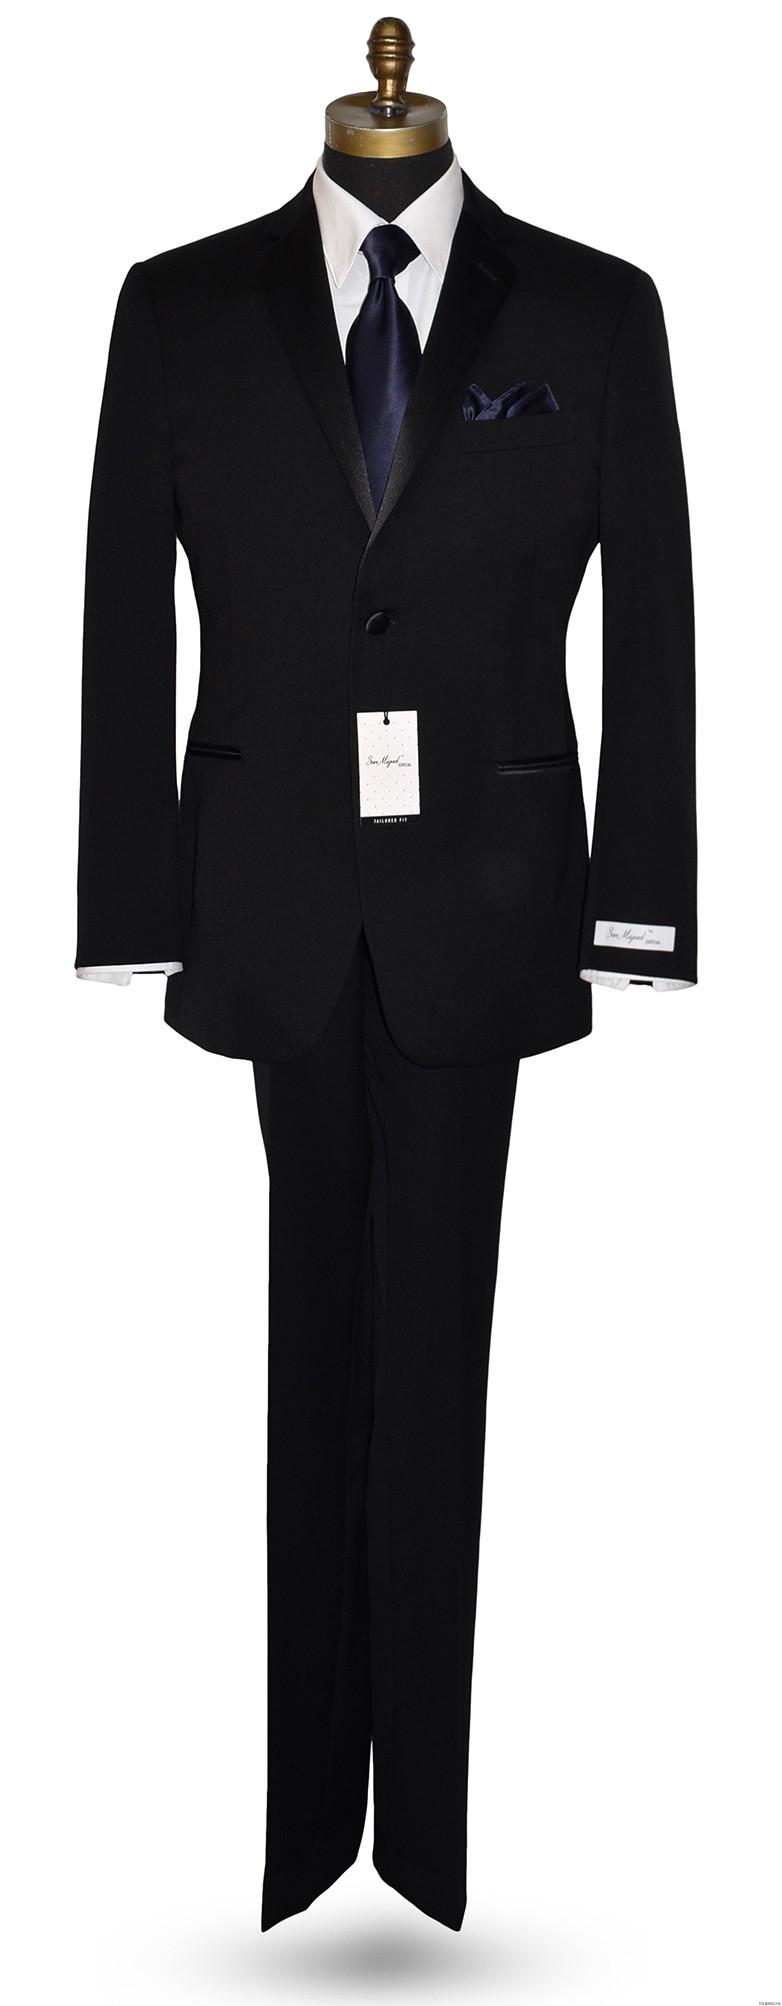 midnight blue silk men's dress tie with black tuxedo by San Miguel Formals